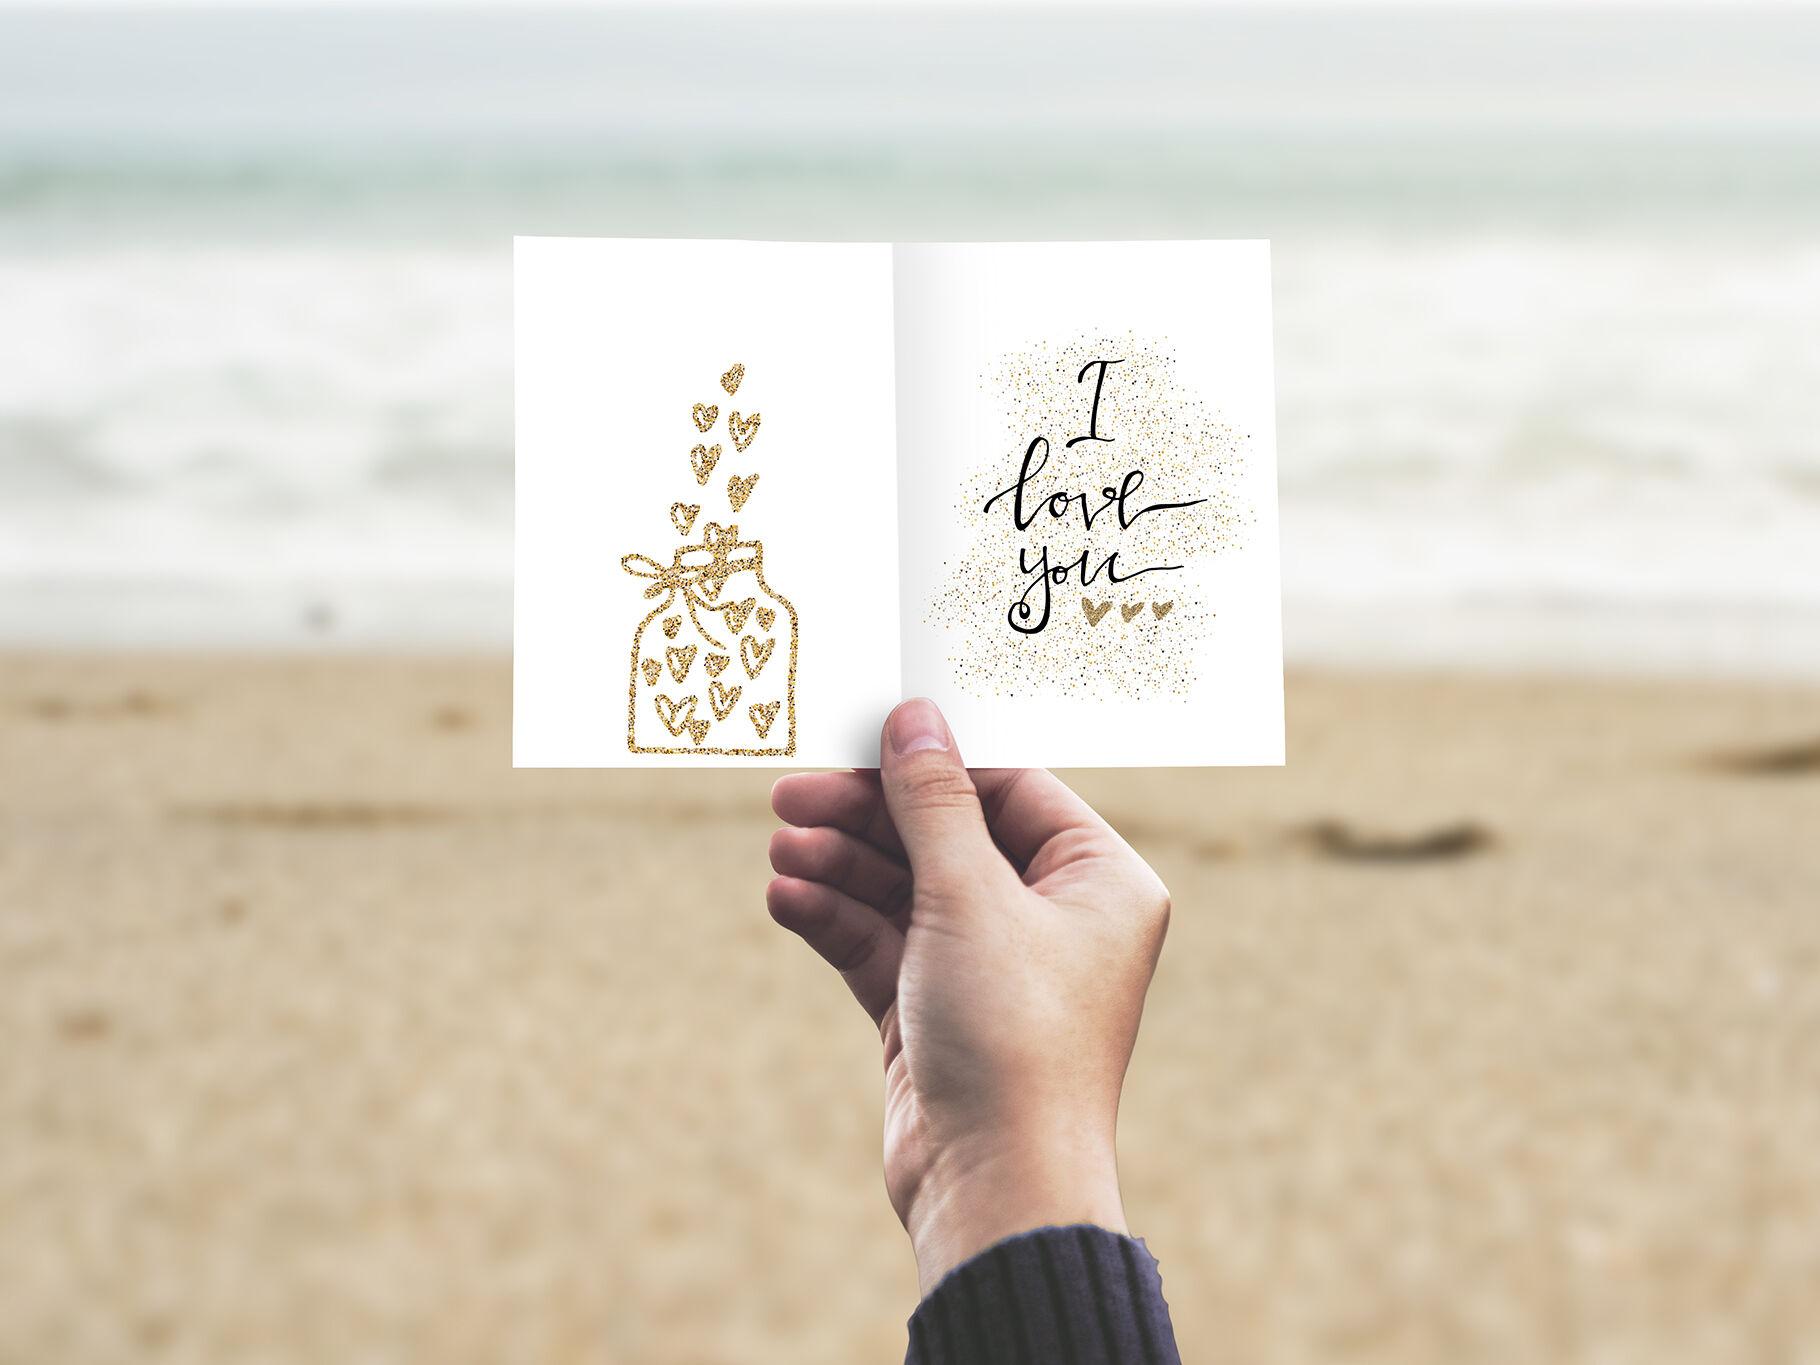 Valentines day clipart ocean